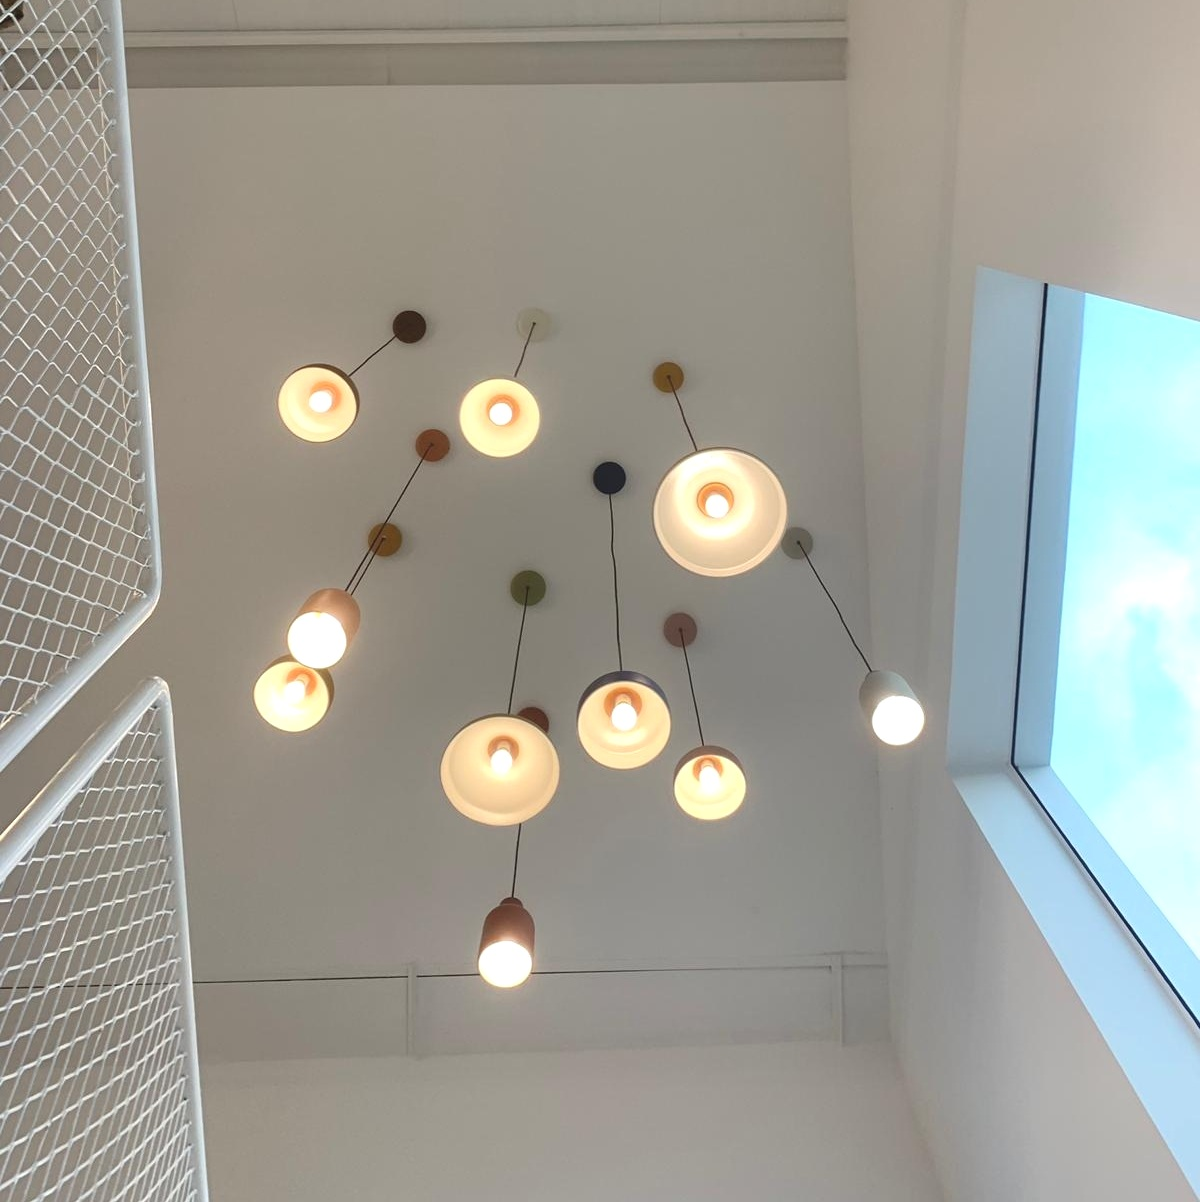 Suspensions / Cremme, lighting